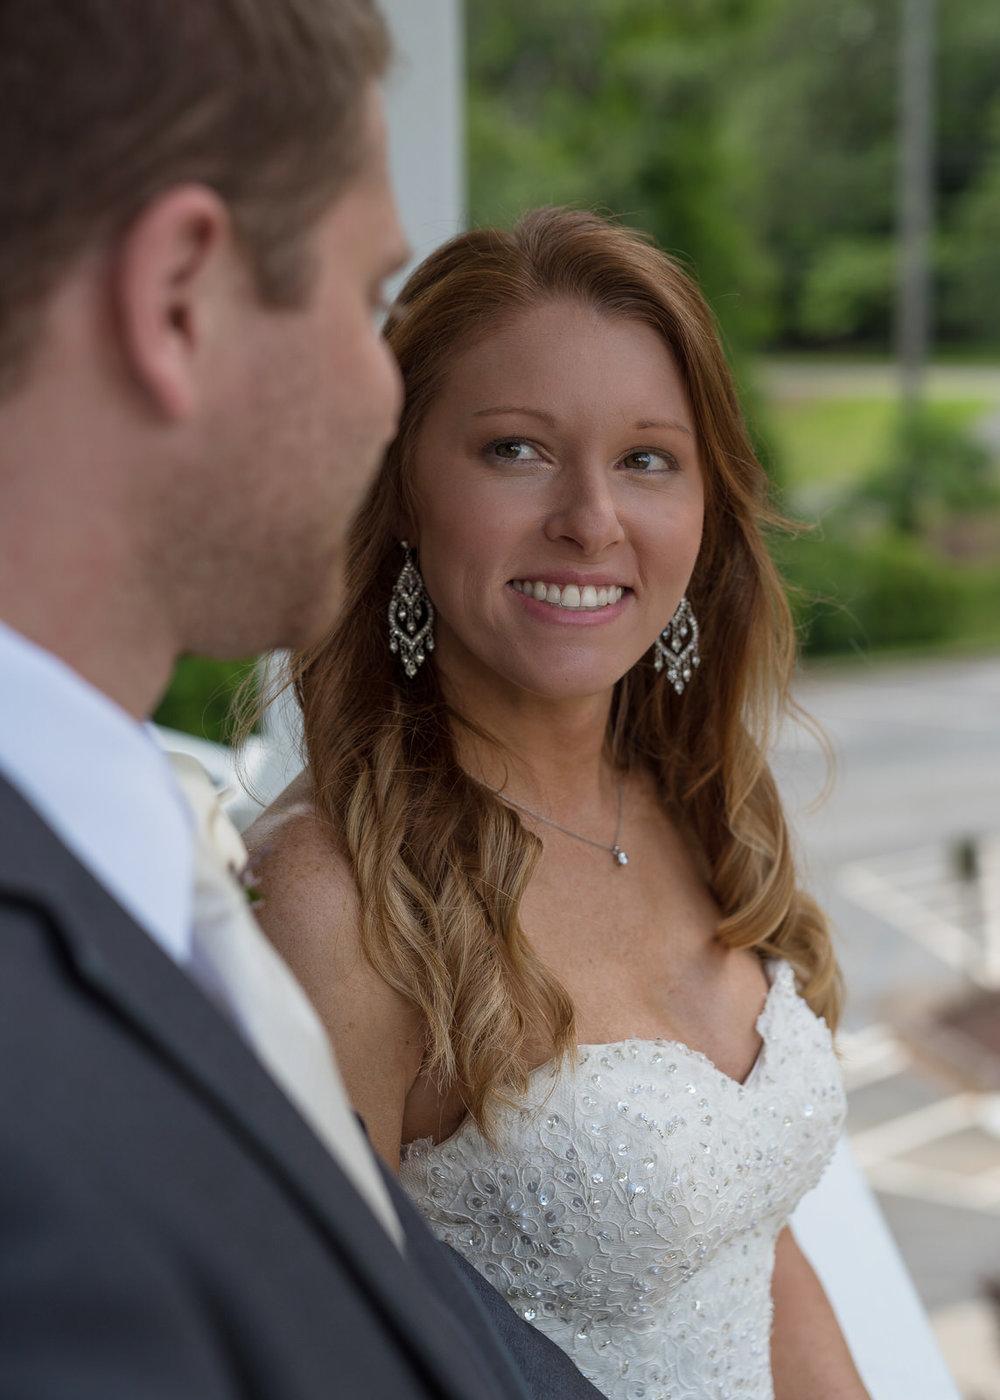 Kennesaw GA, Happy bride and groom on wedding day